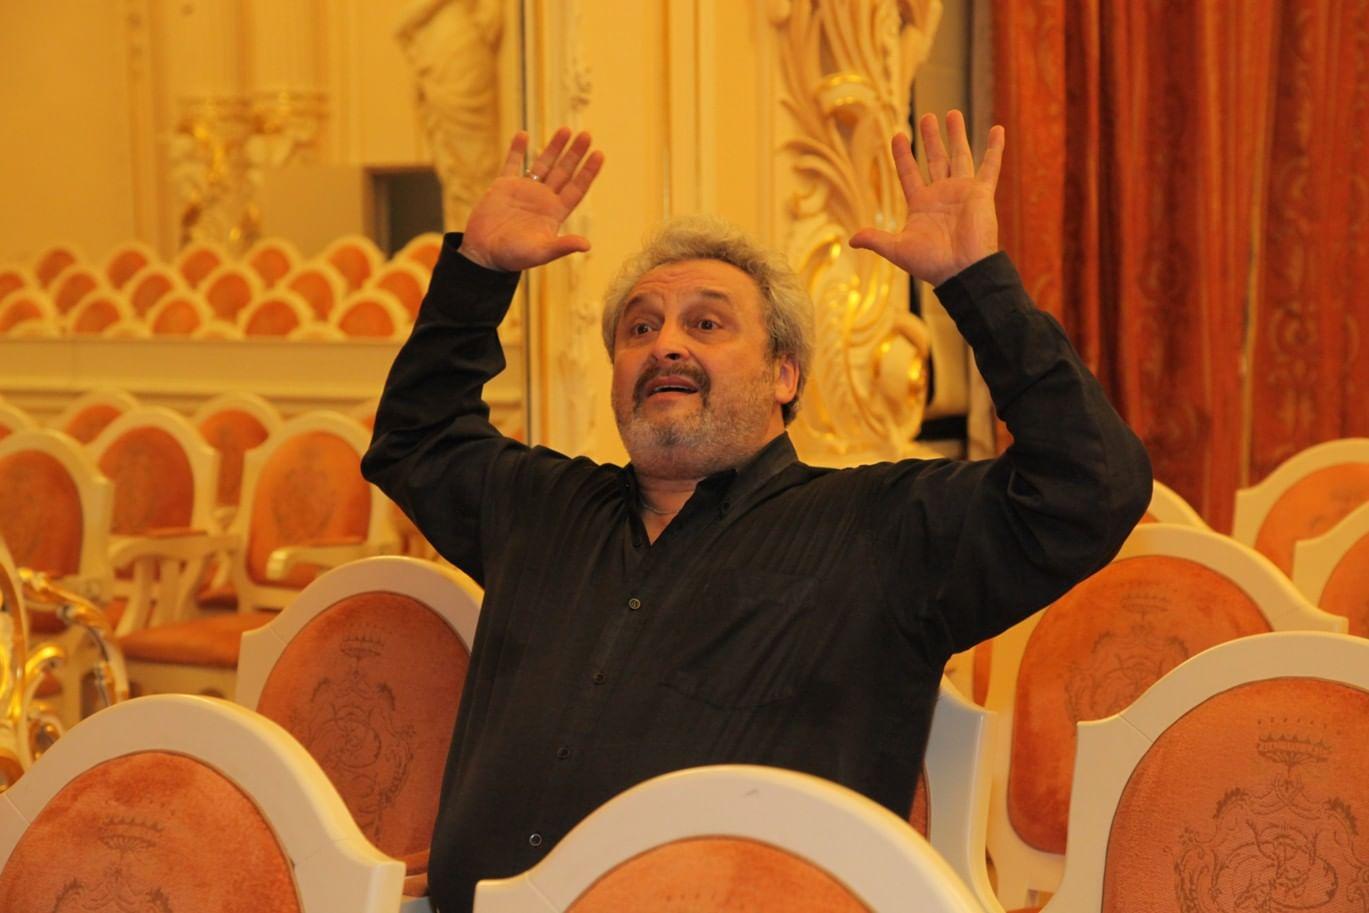 Юрий Александров: «Театр должен оставаться храмом». Галерея 2